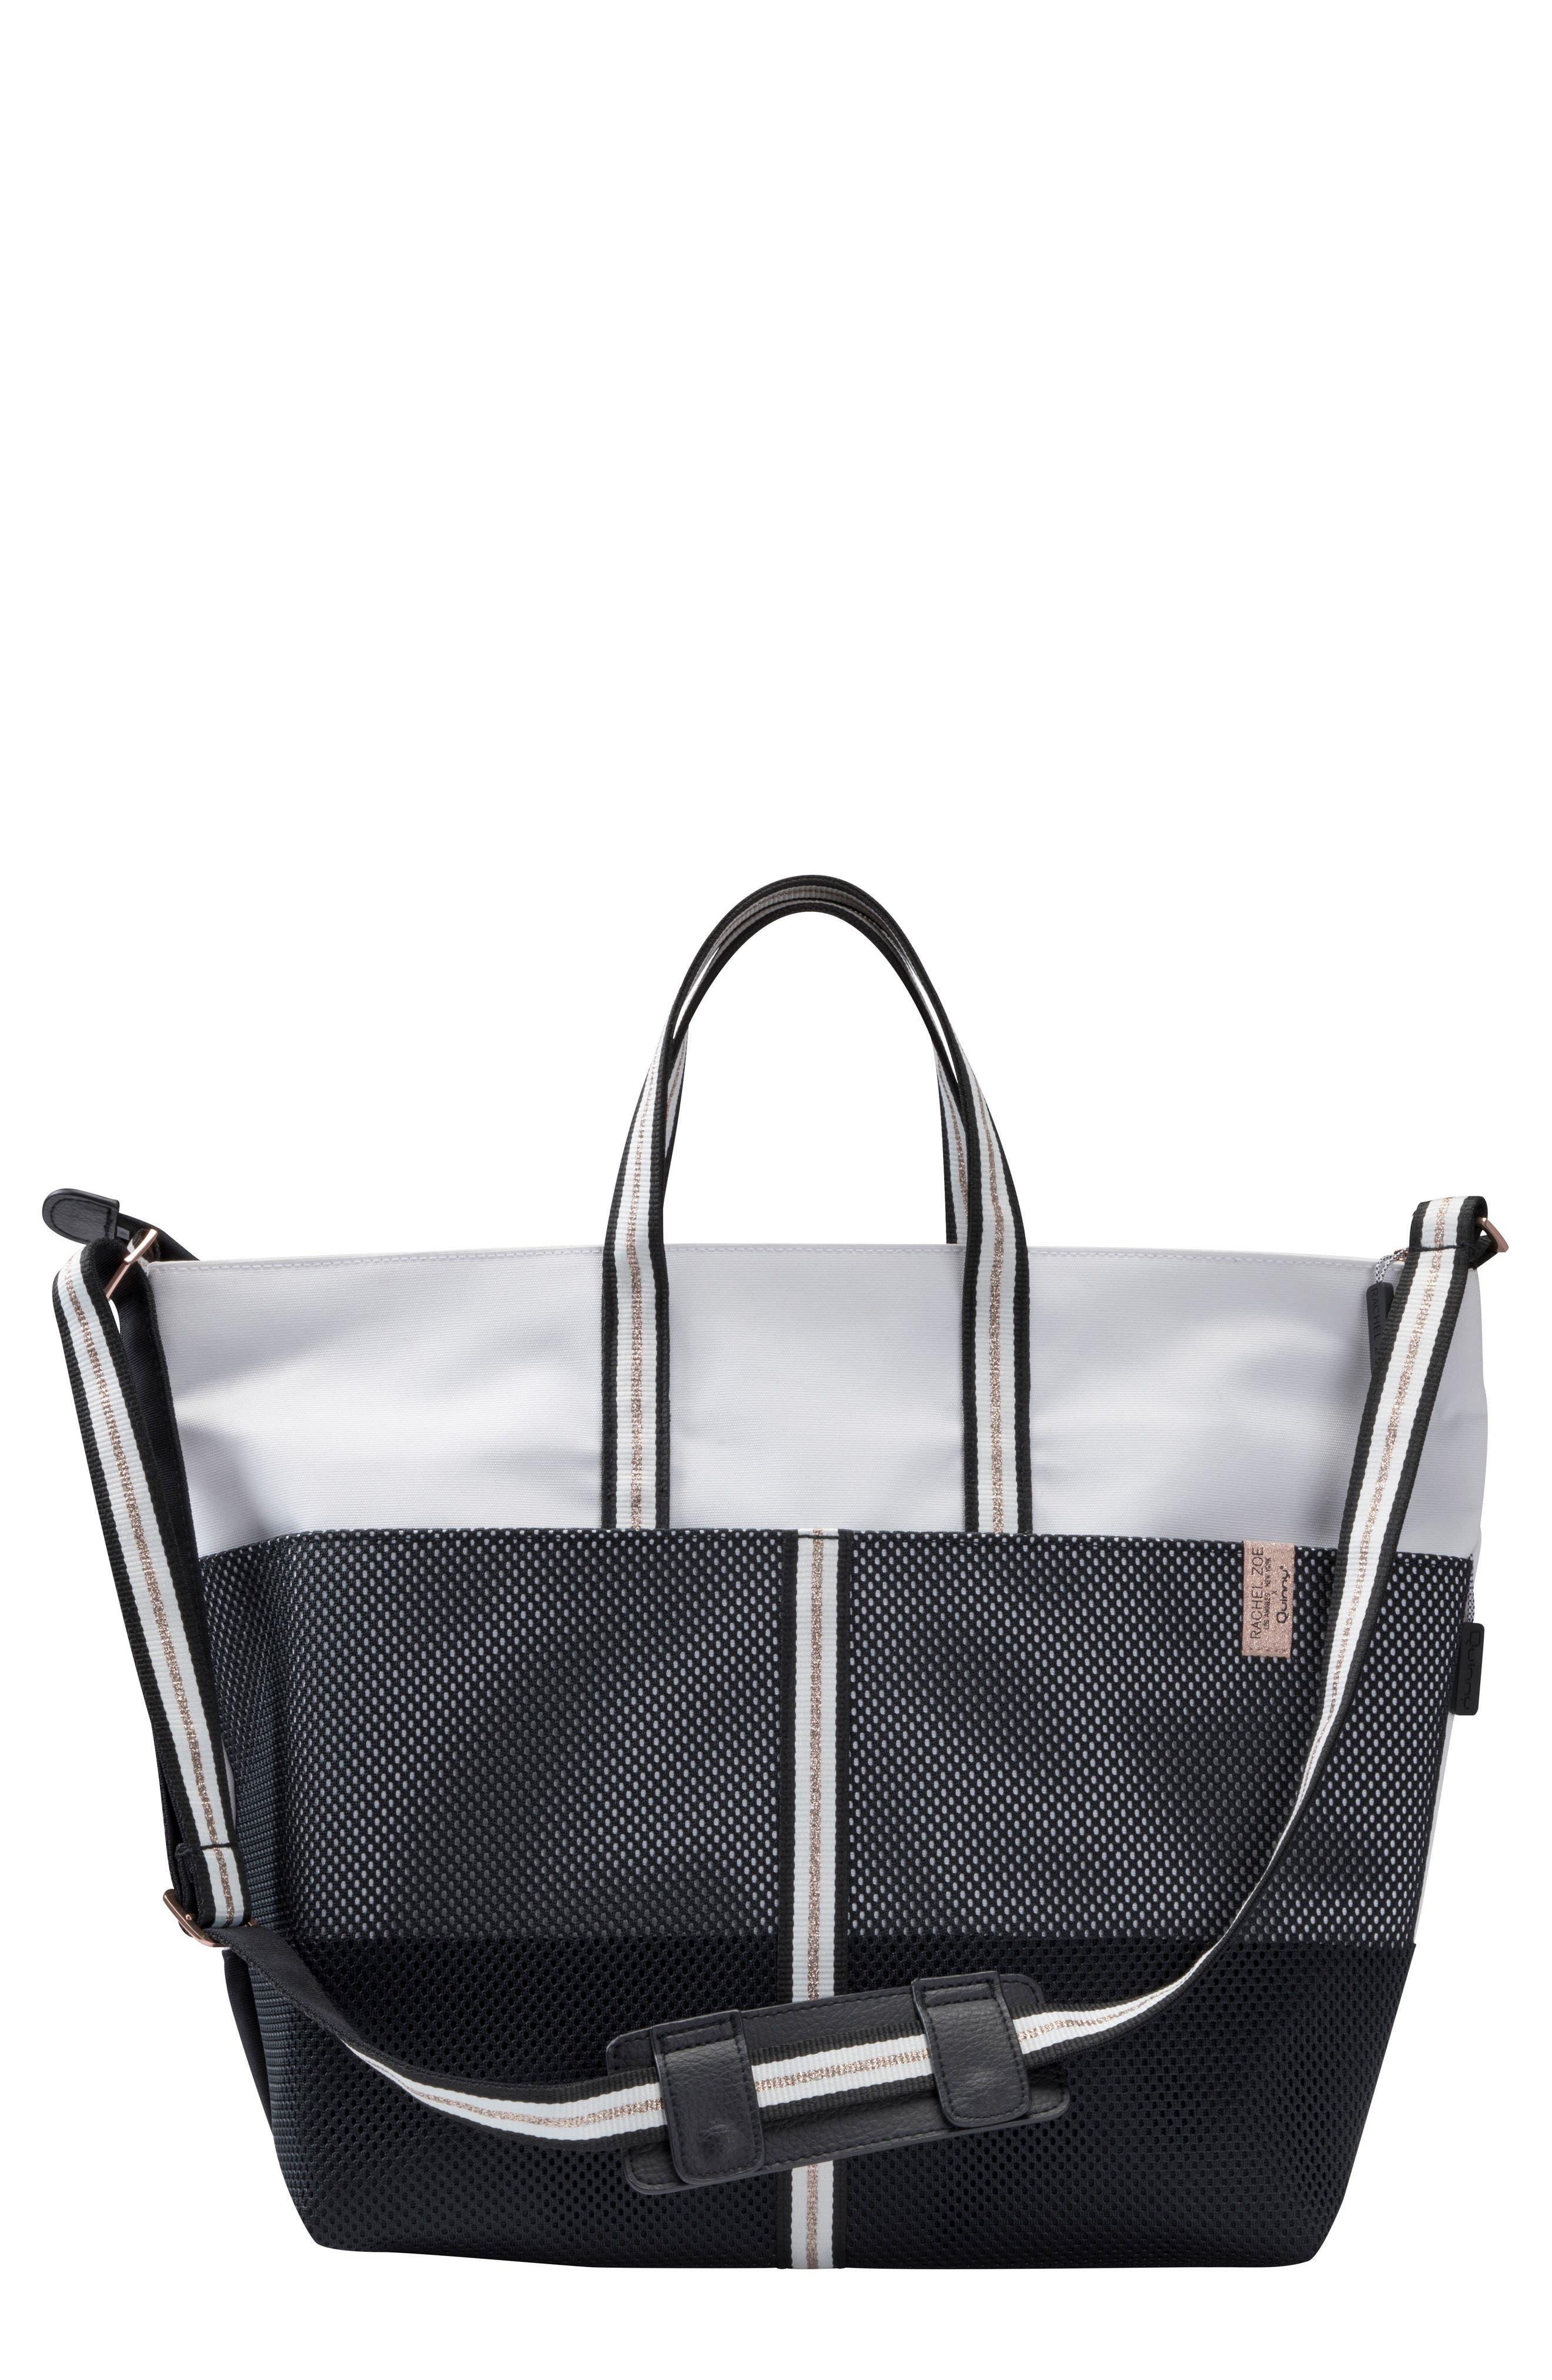 x Rachel Zoe Luxe Sport Diaper Bag,                             Main thumbnail 1, color,                             RZ LUXE SPORT